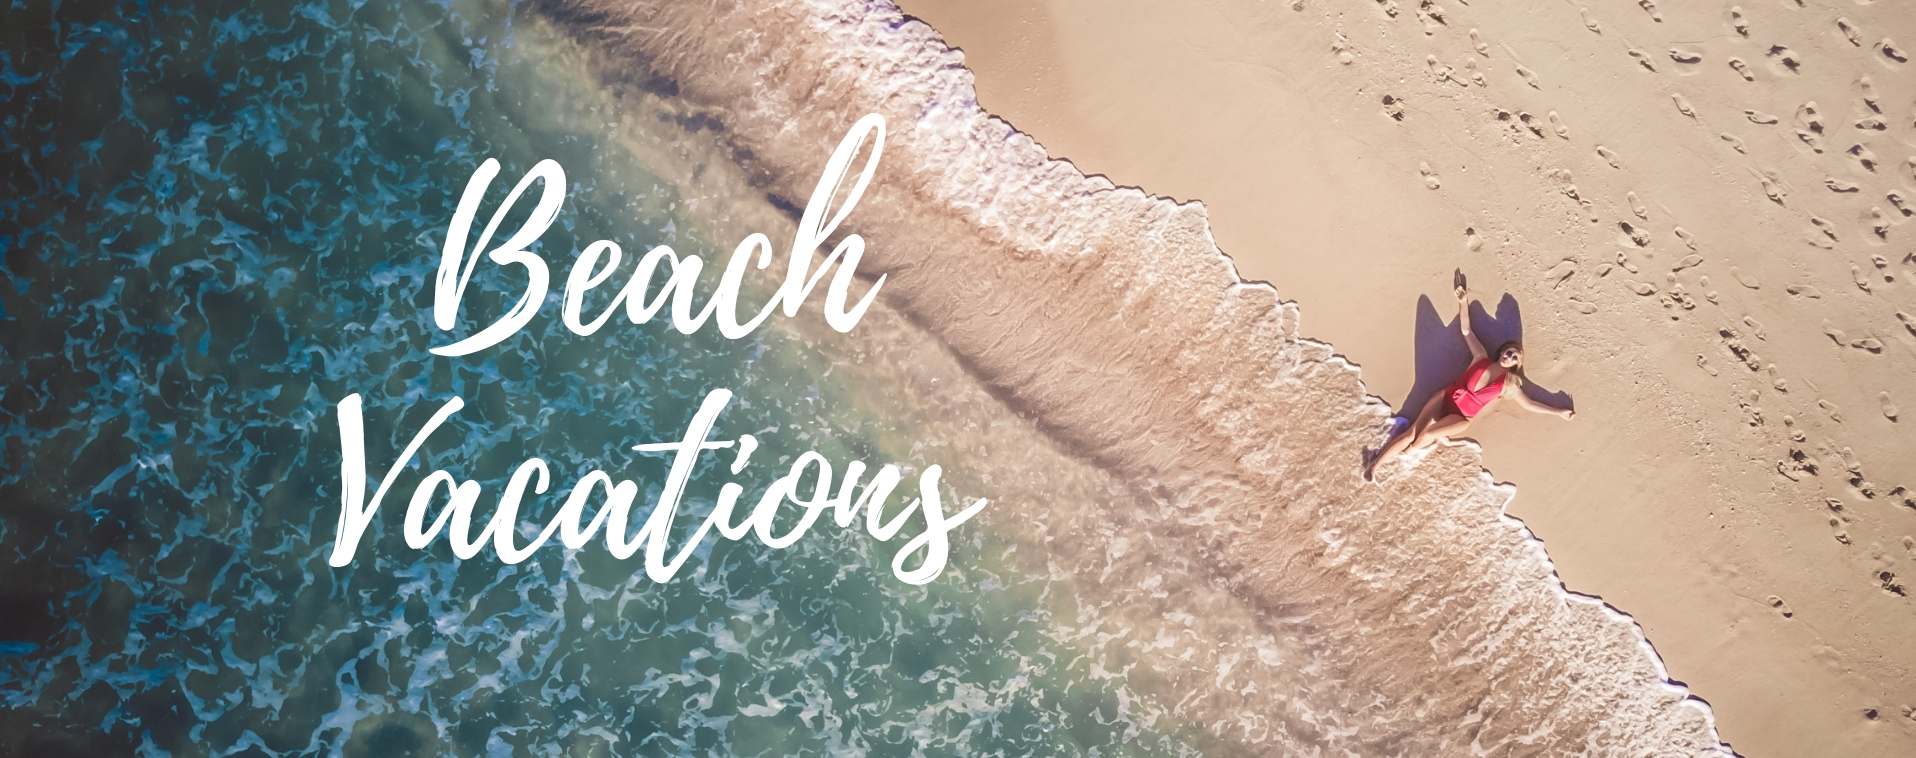 Beach Vacations 1916x758